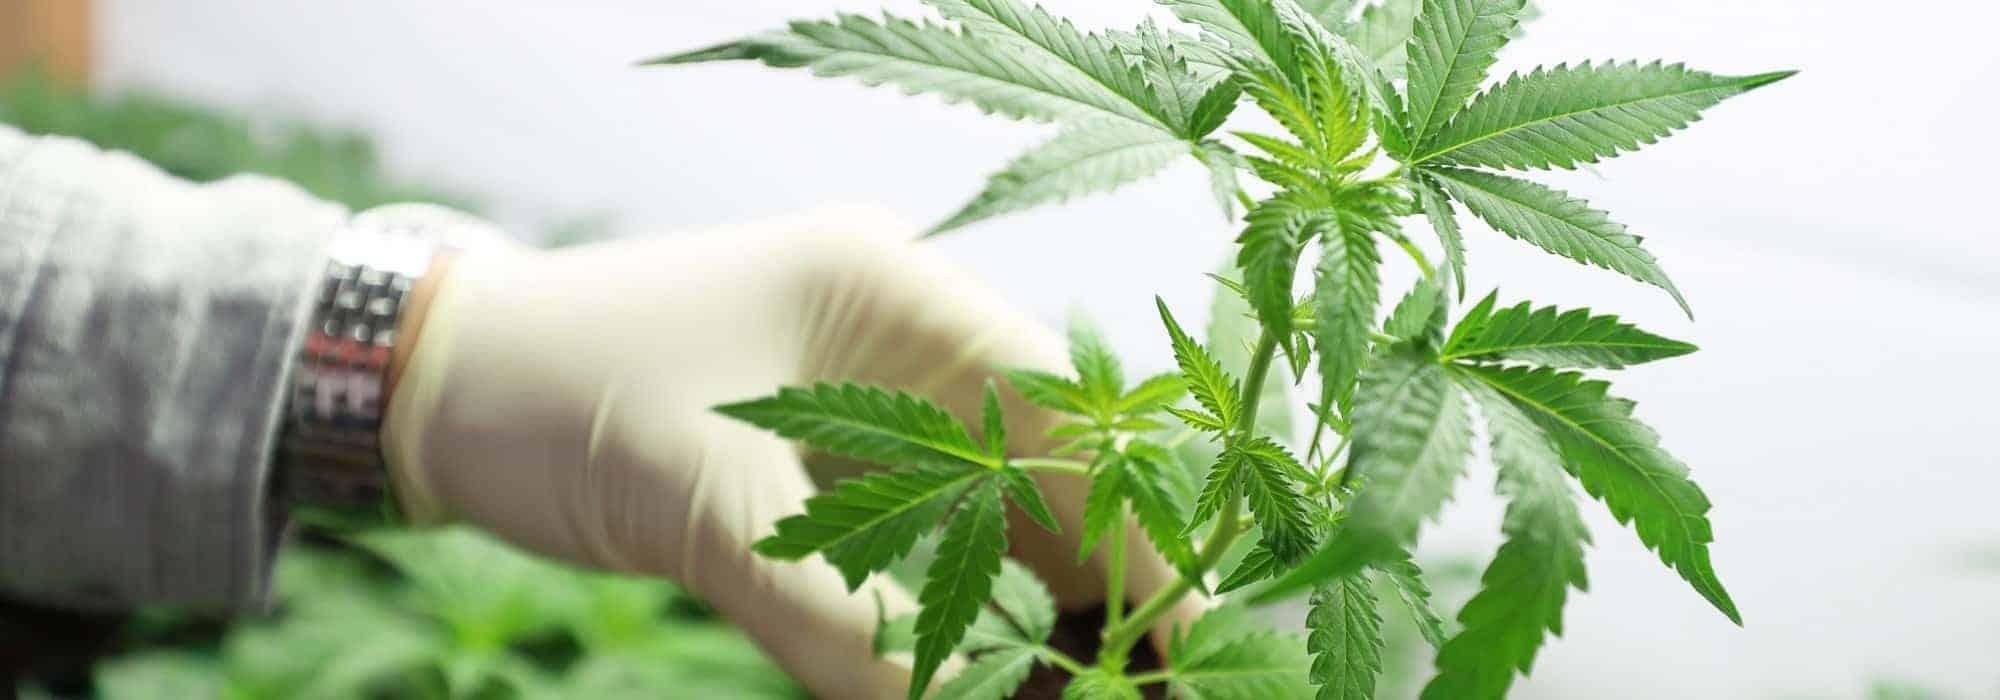 cannabis parkinson